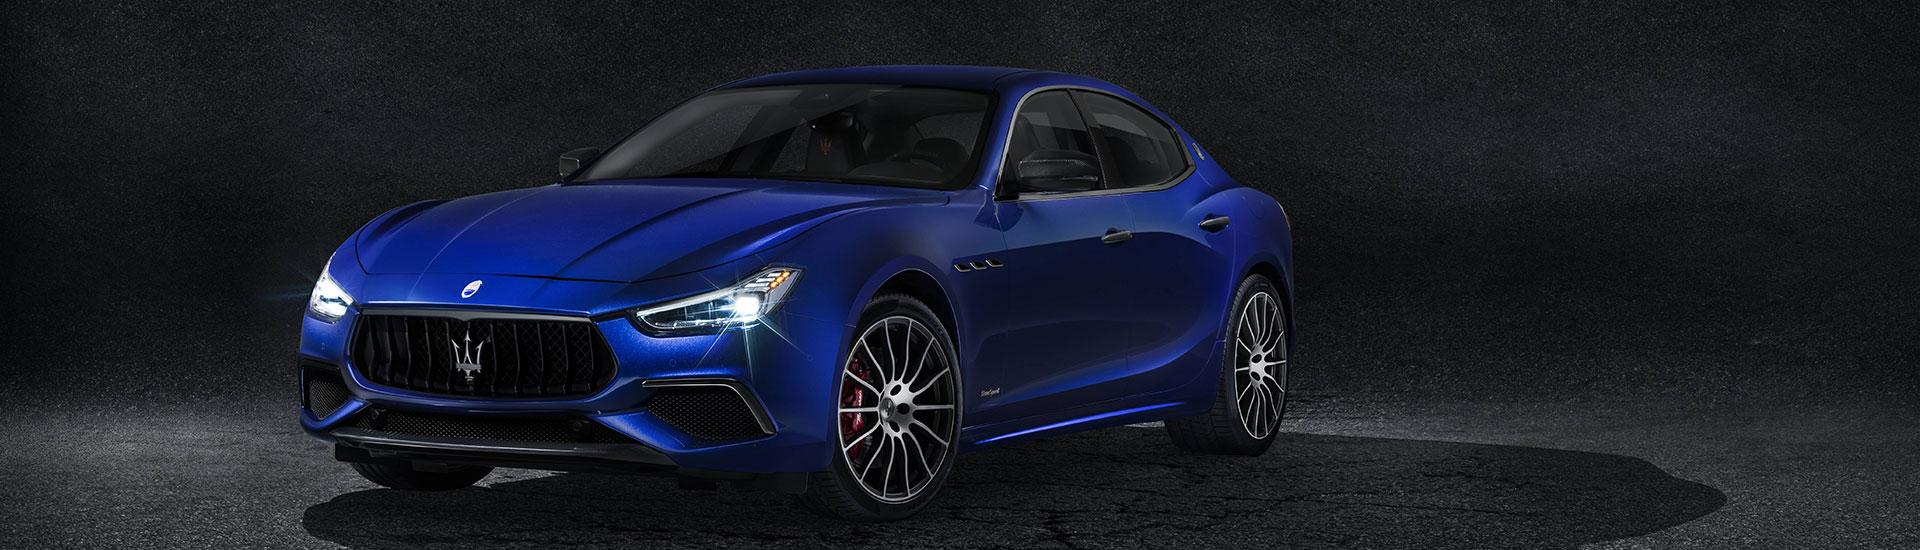 New Maserati Ghibli Sedan Cars For Sale - carsales.com.au